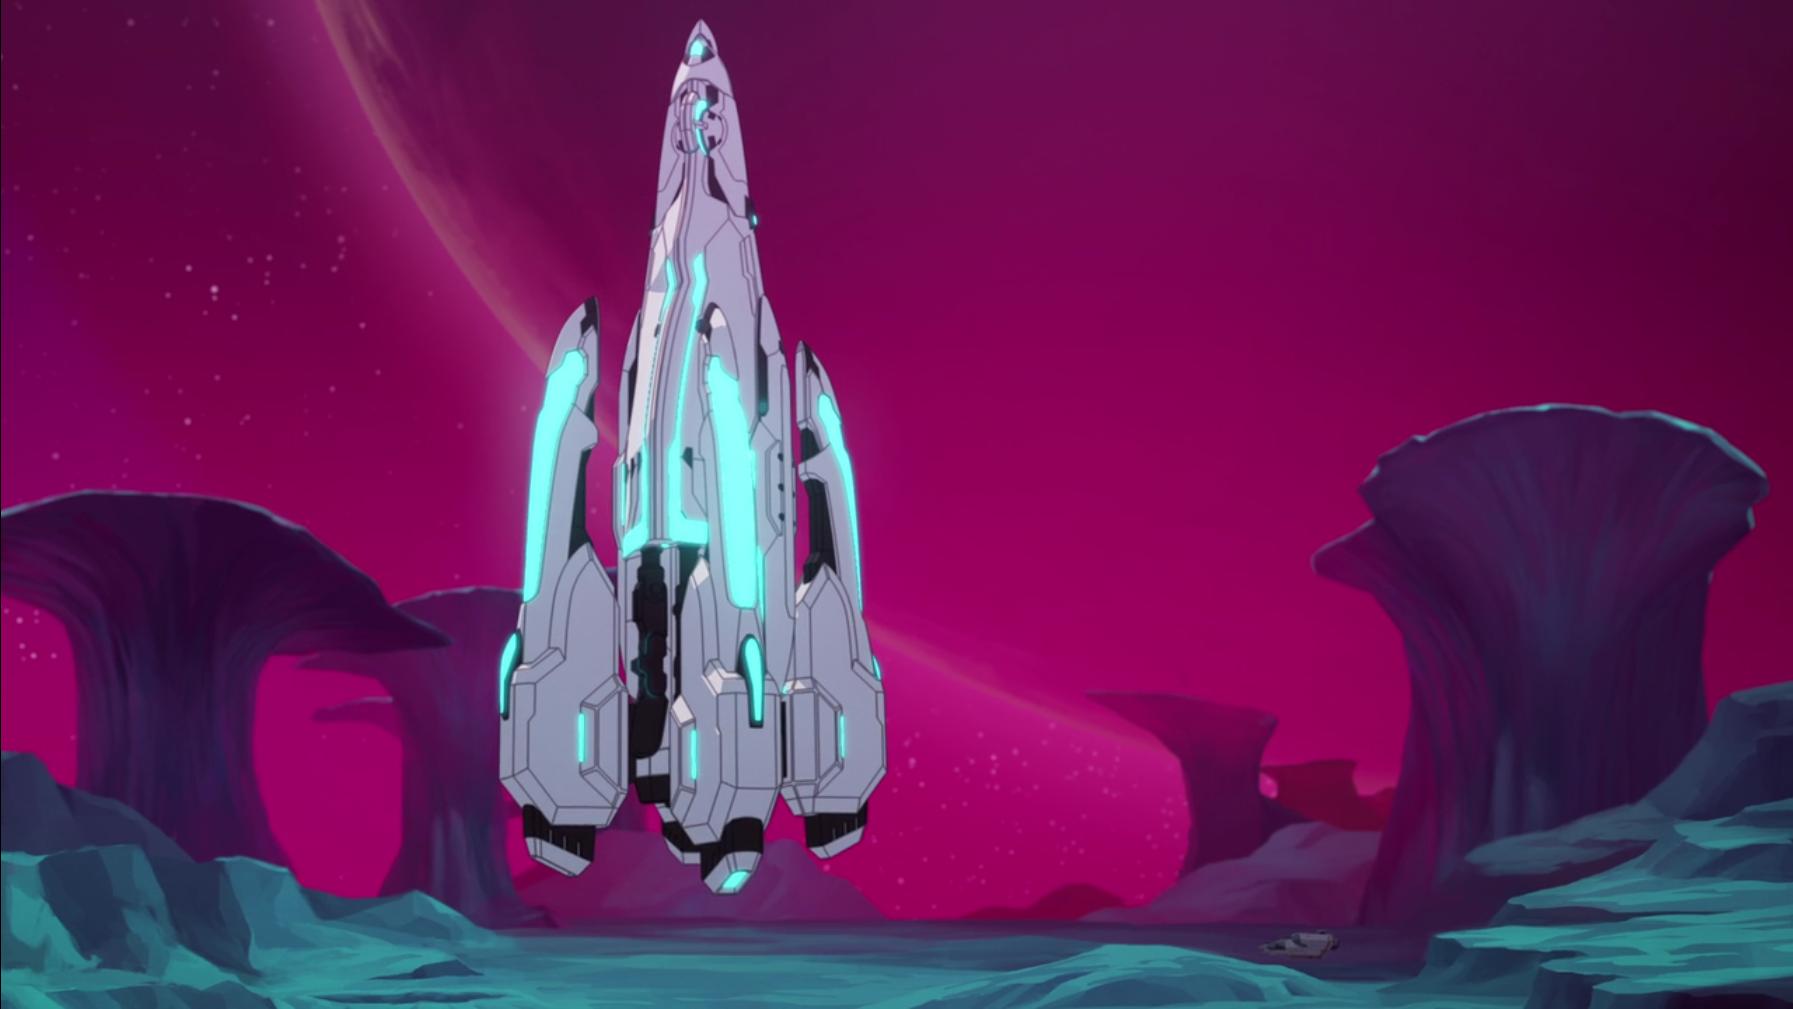 castle goes vertical for landingpng